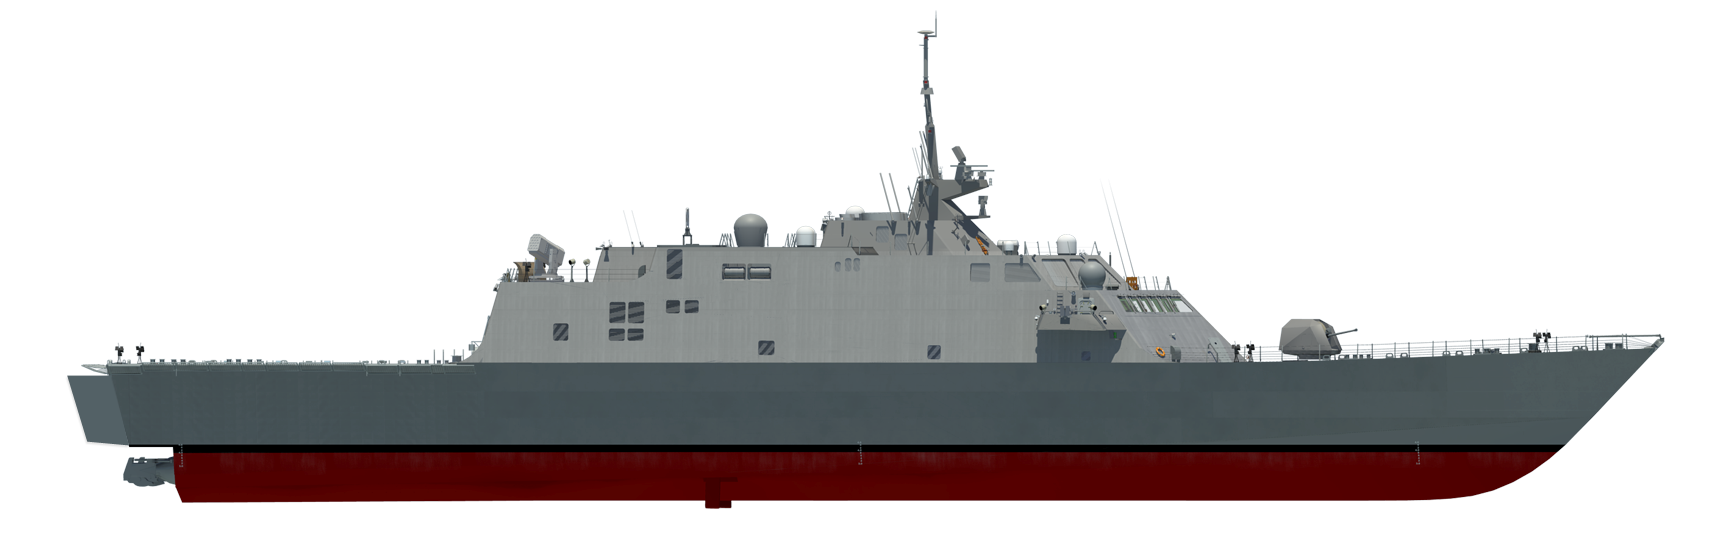 Grafik LCS FREEDOM-ClassGrafik: U.S. Navy